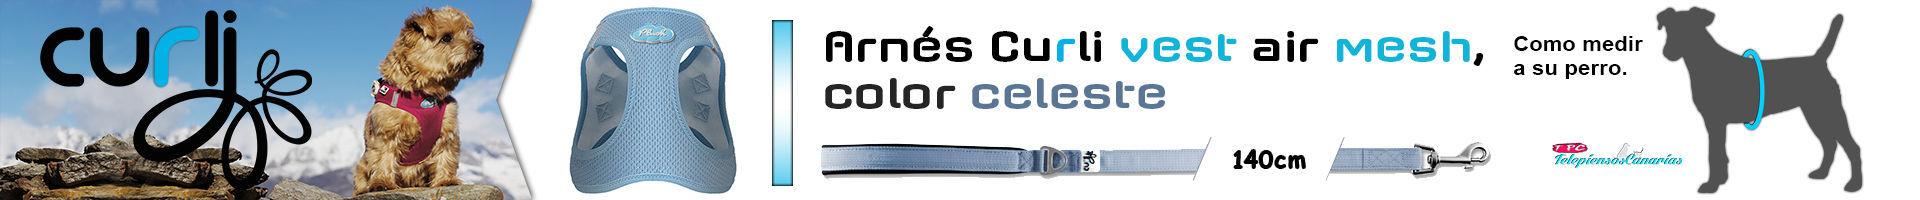 Arnés Curli vest air mesh, color celeste, con bandas reflectores